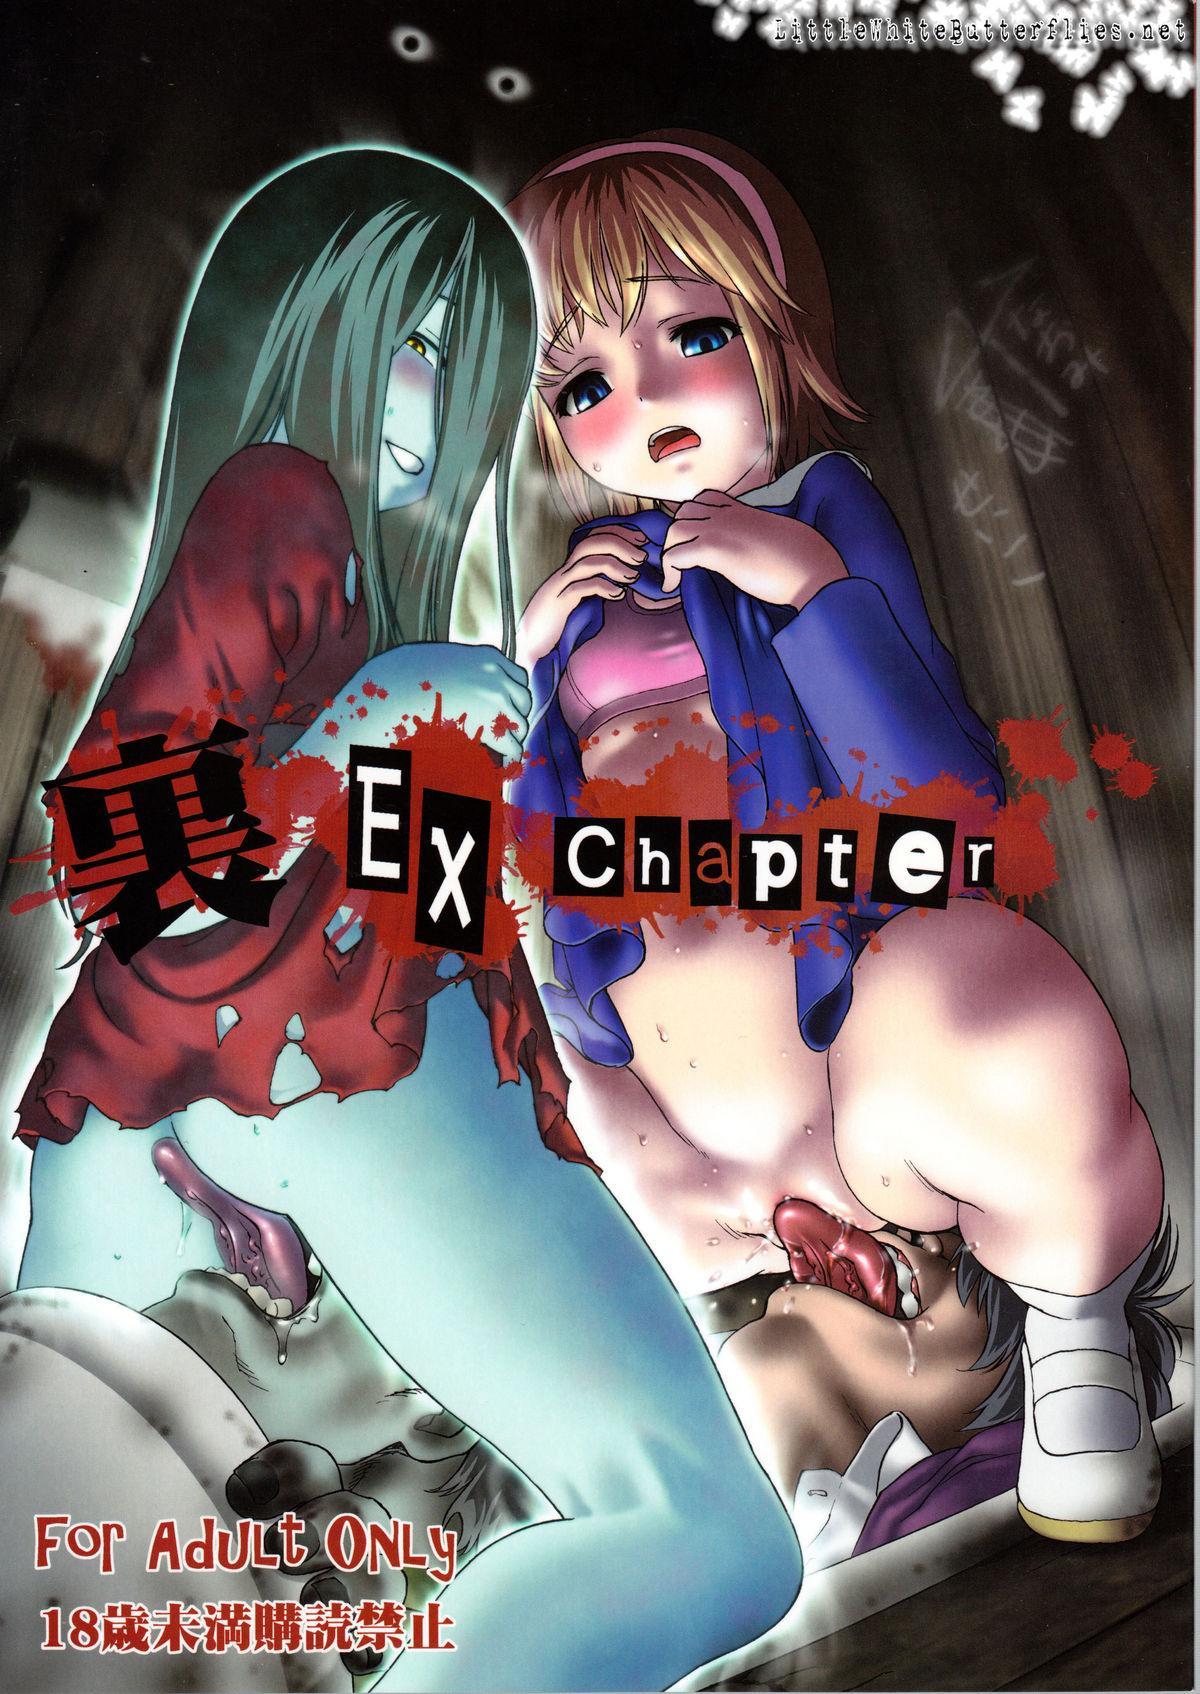 Ura EX chapter 0